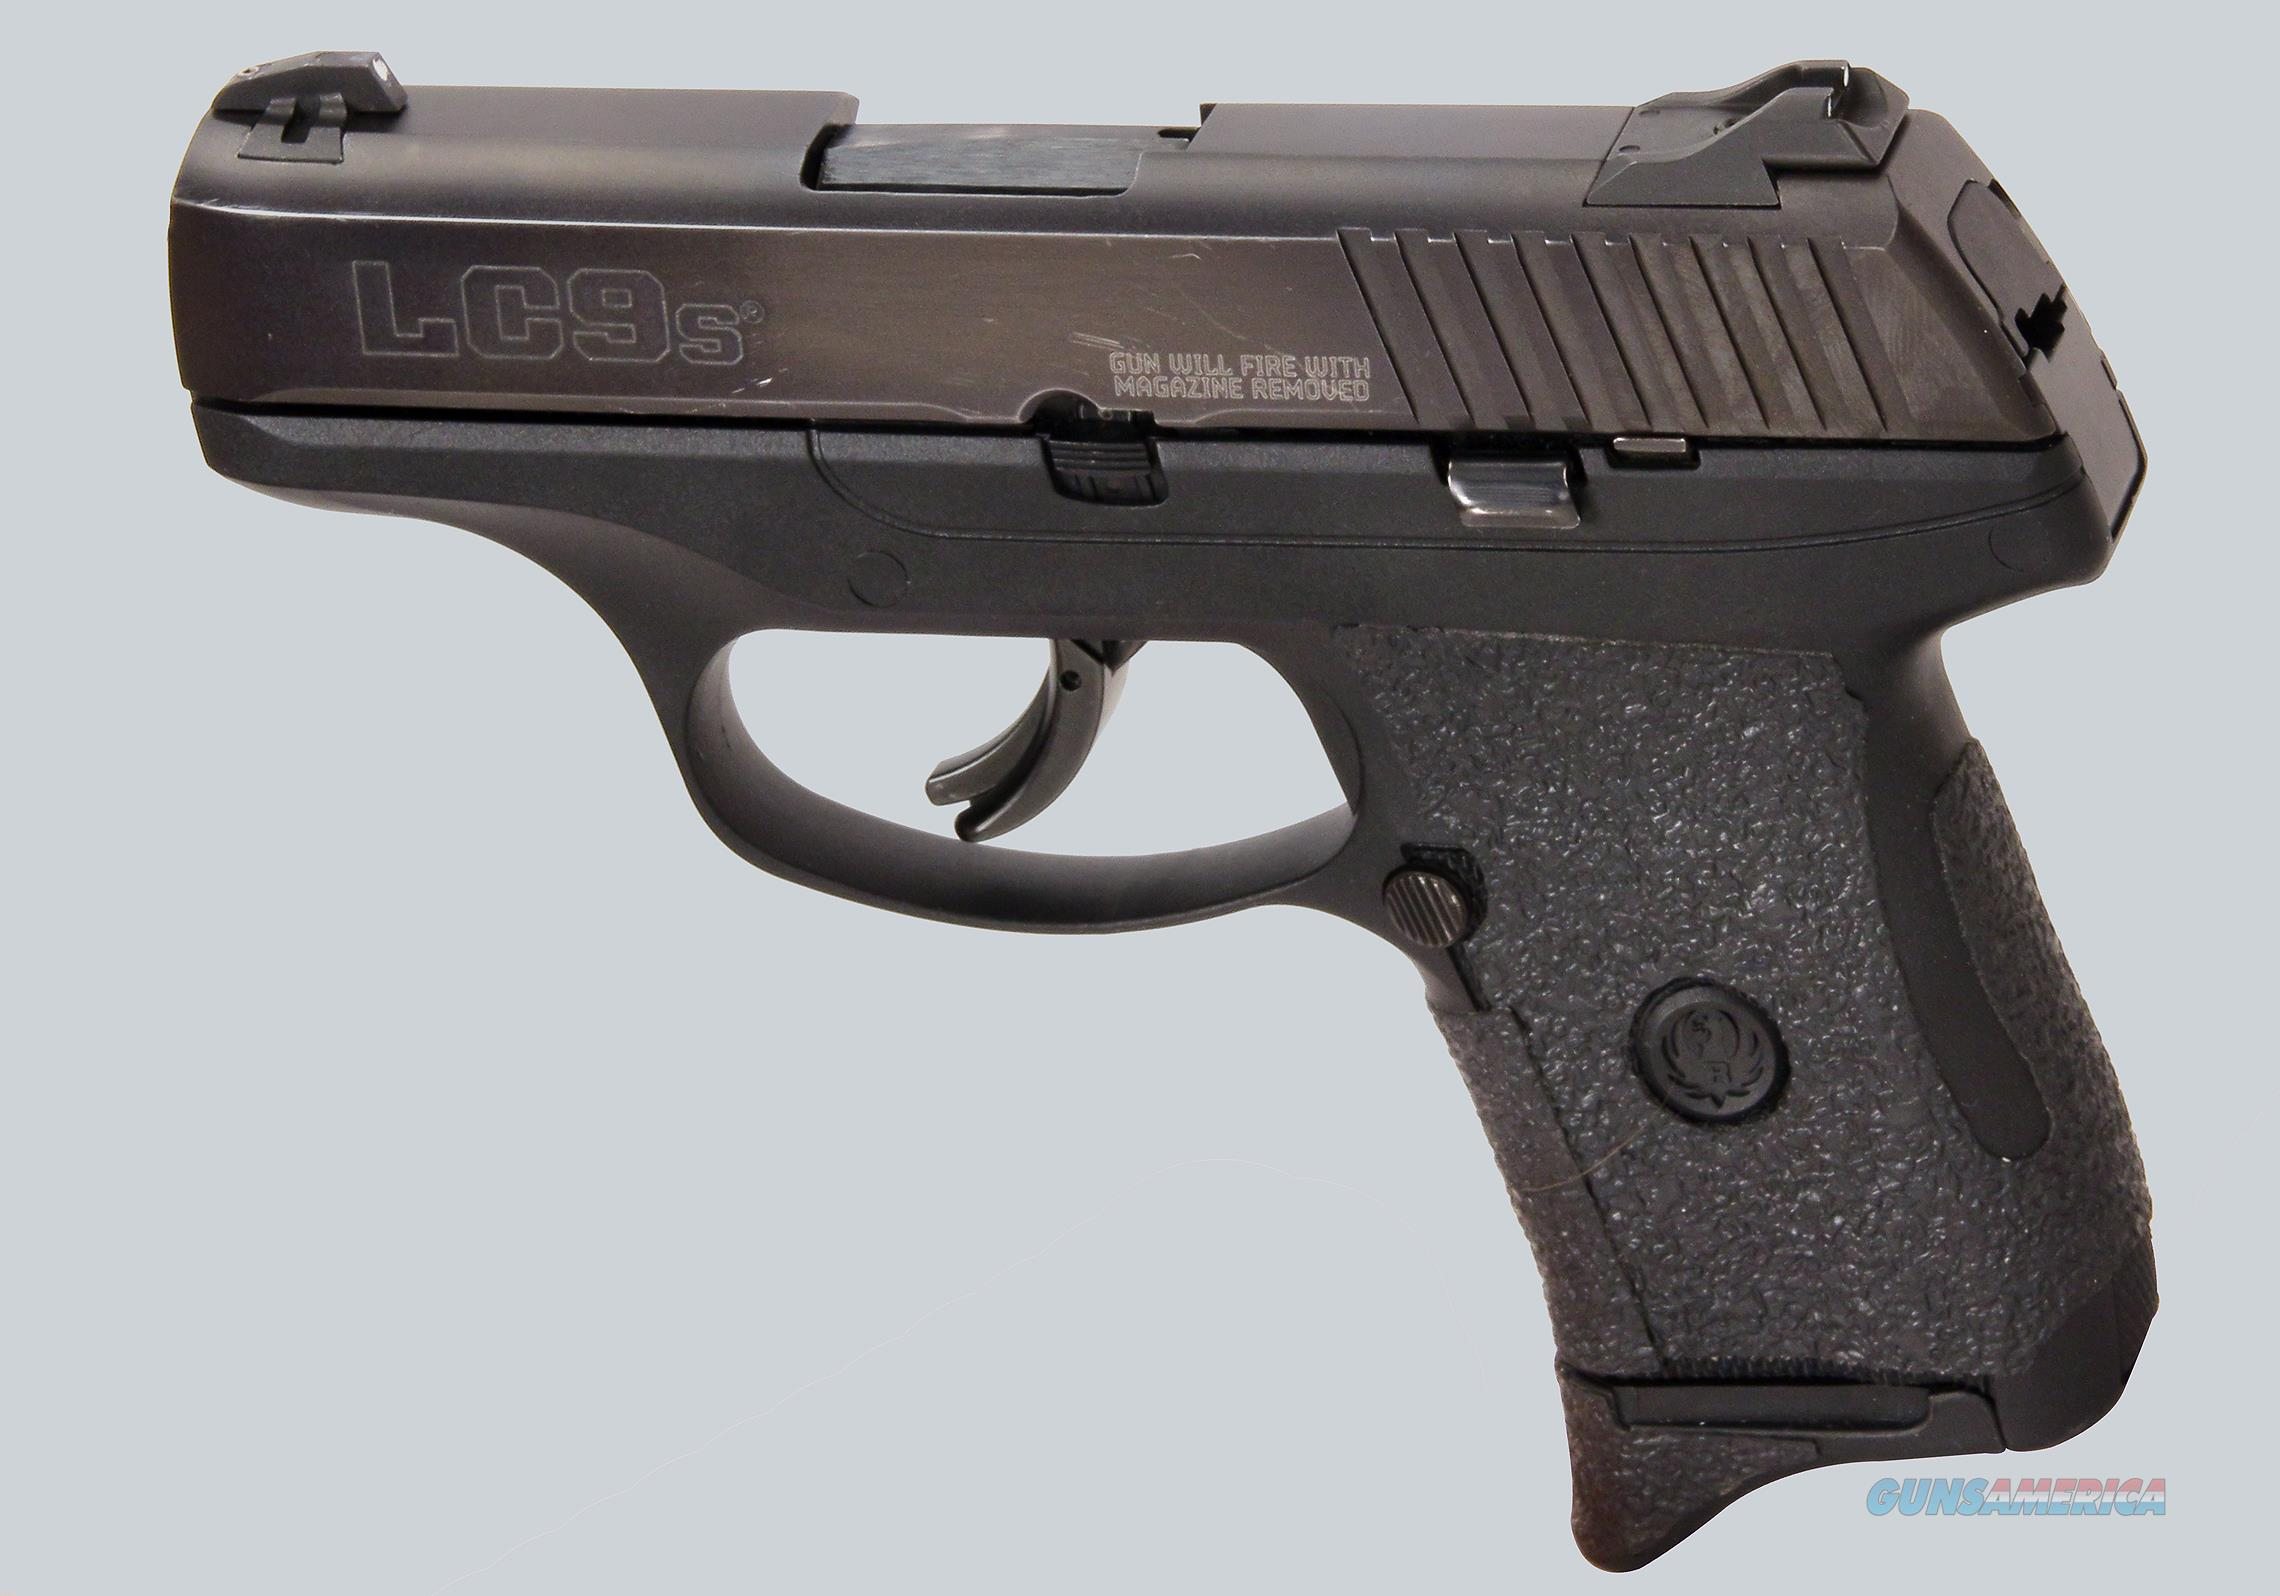 Ruger 9mm LC9S Pro Pistol  Guns > Pistols > Ruger Semi-Auto Pistols > LC9